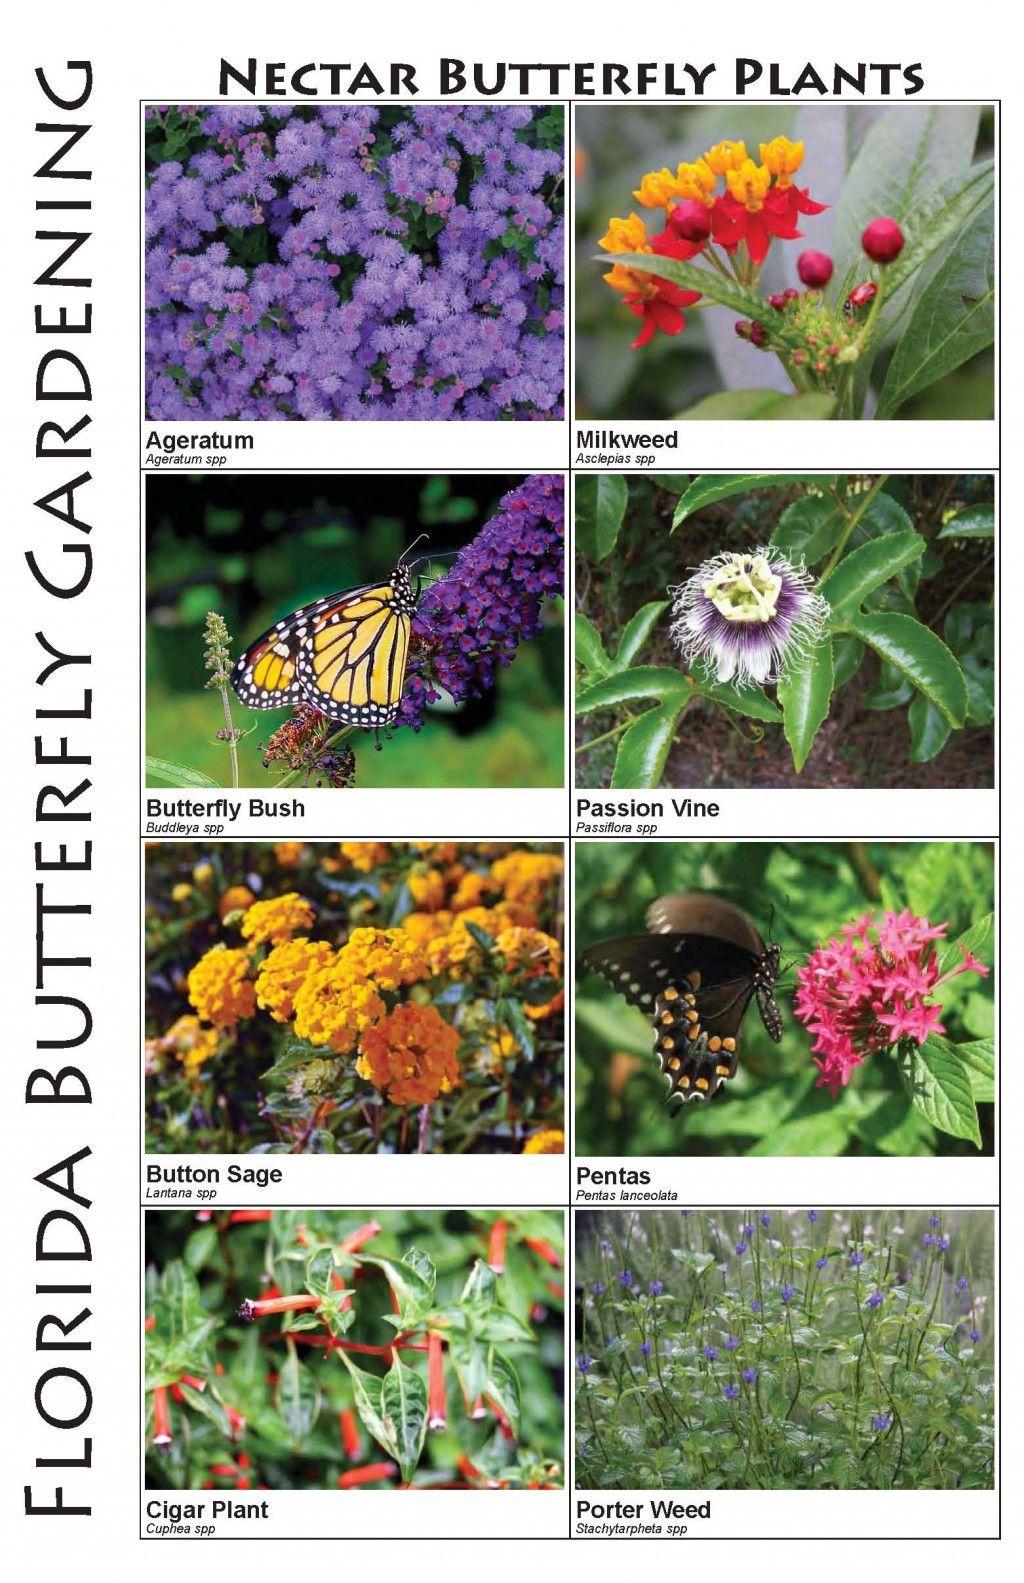 Butterflies Butterfly Plants Of Central Florida Butterfly Plants Florida Plants Florida Flowers